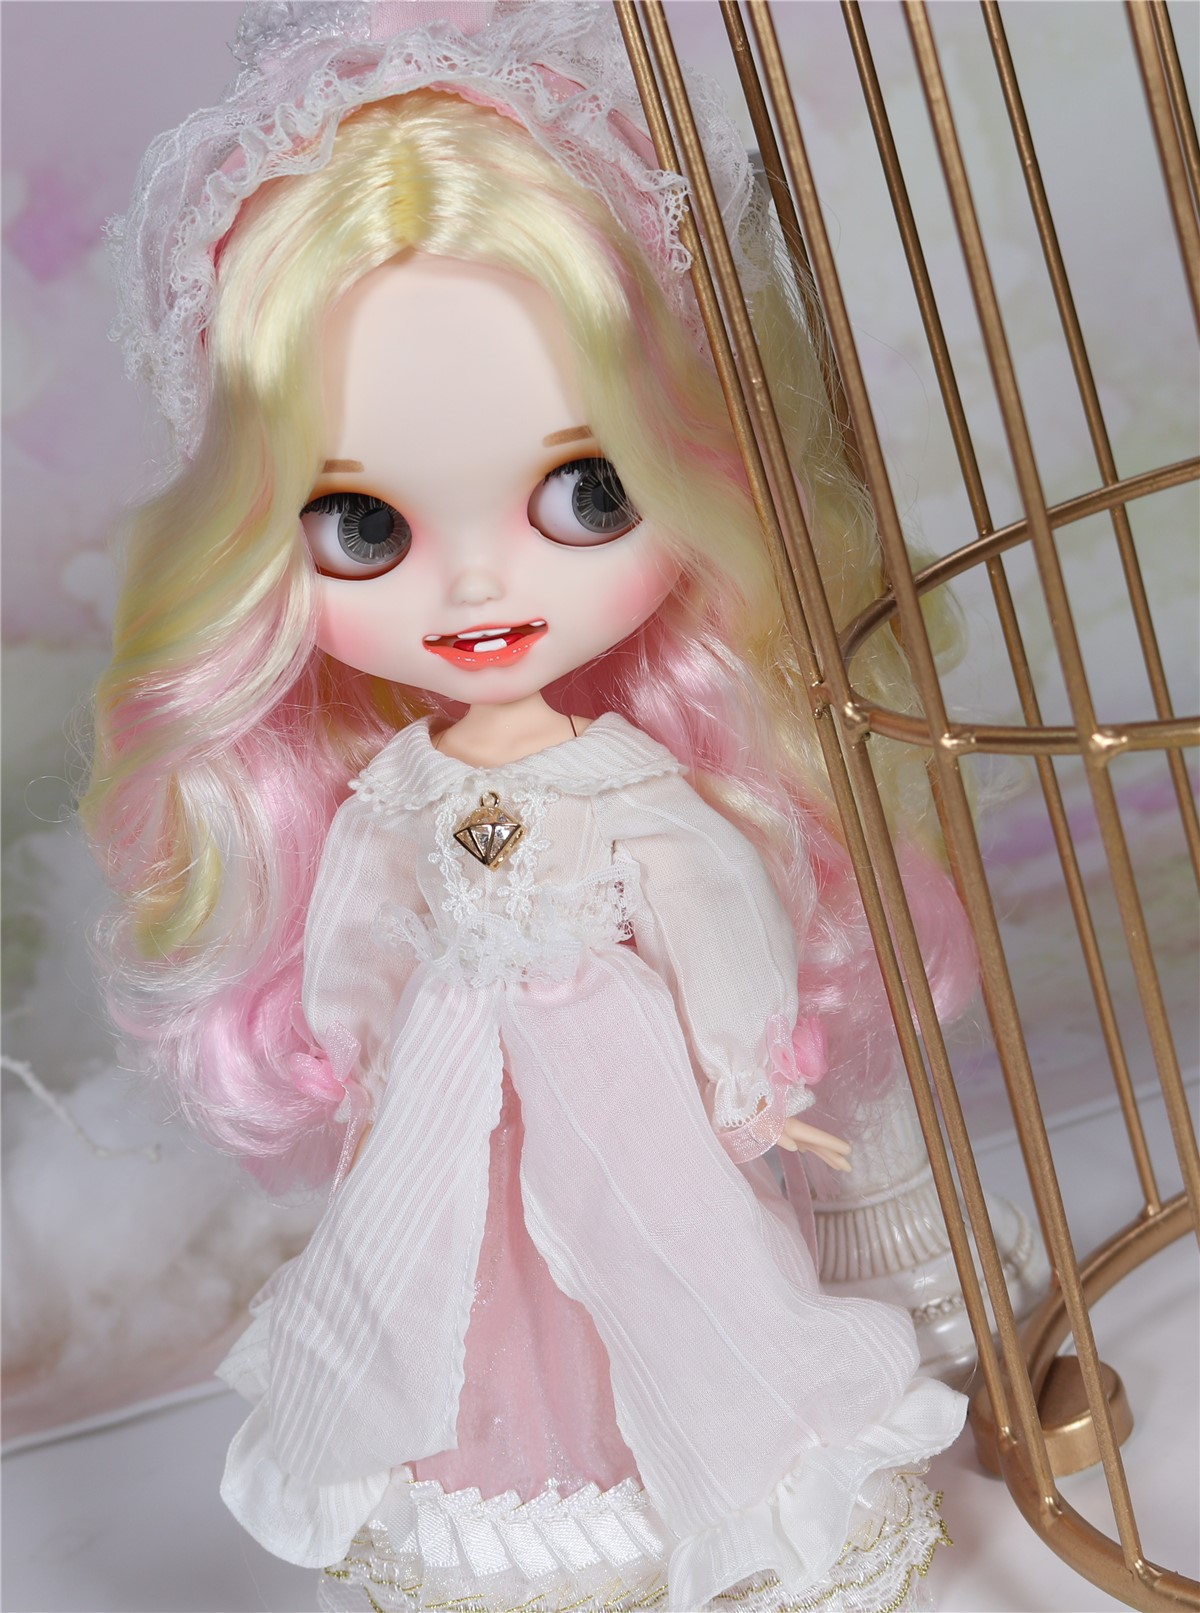 Gabrielle – Premium Custom Blythe Doll with Clothes Smiling Face Premium Blythe Dolls 🆕 Smiling Face